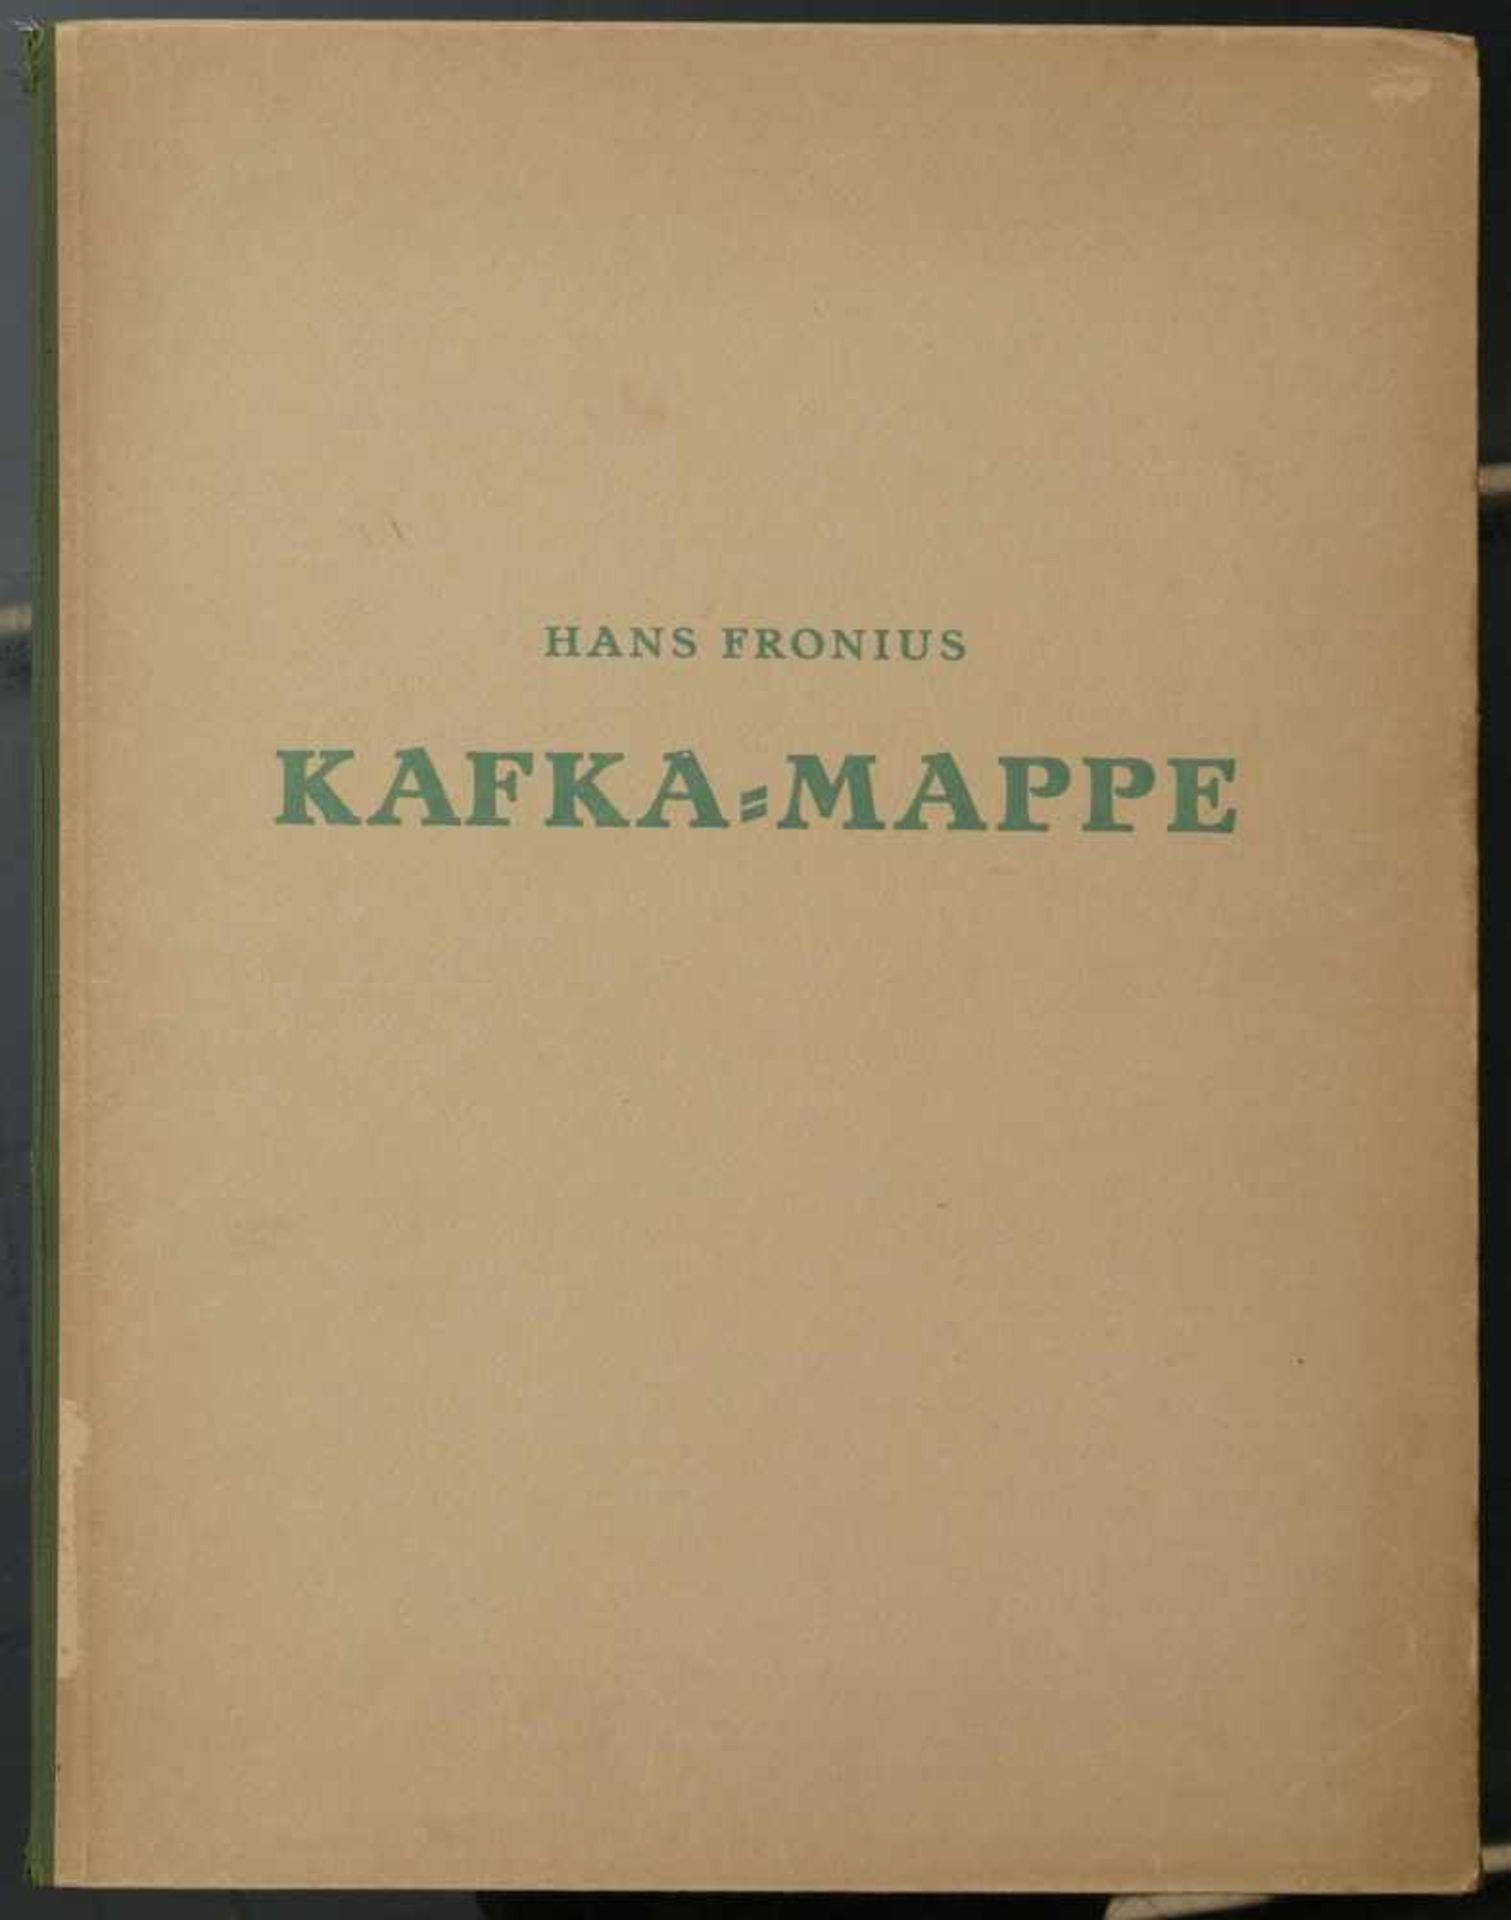 Los 50 - Fronius, Hans (1903-1988) - Kafka Mappe Wien 1946 10 BlattZehn Lichtdrucke nach